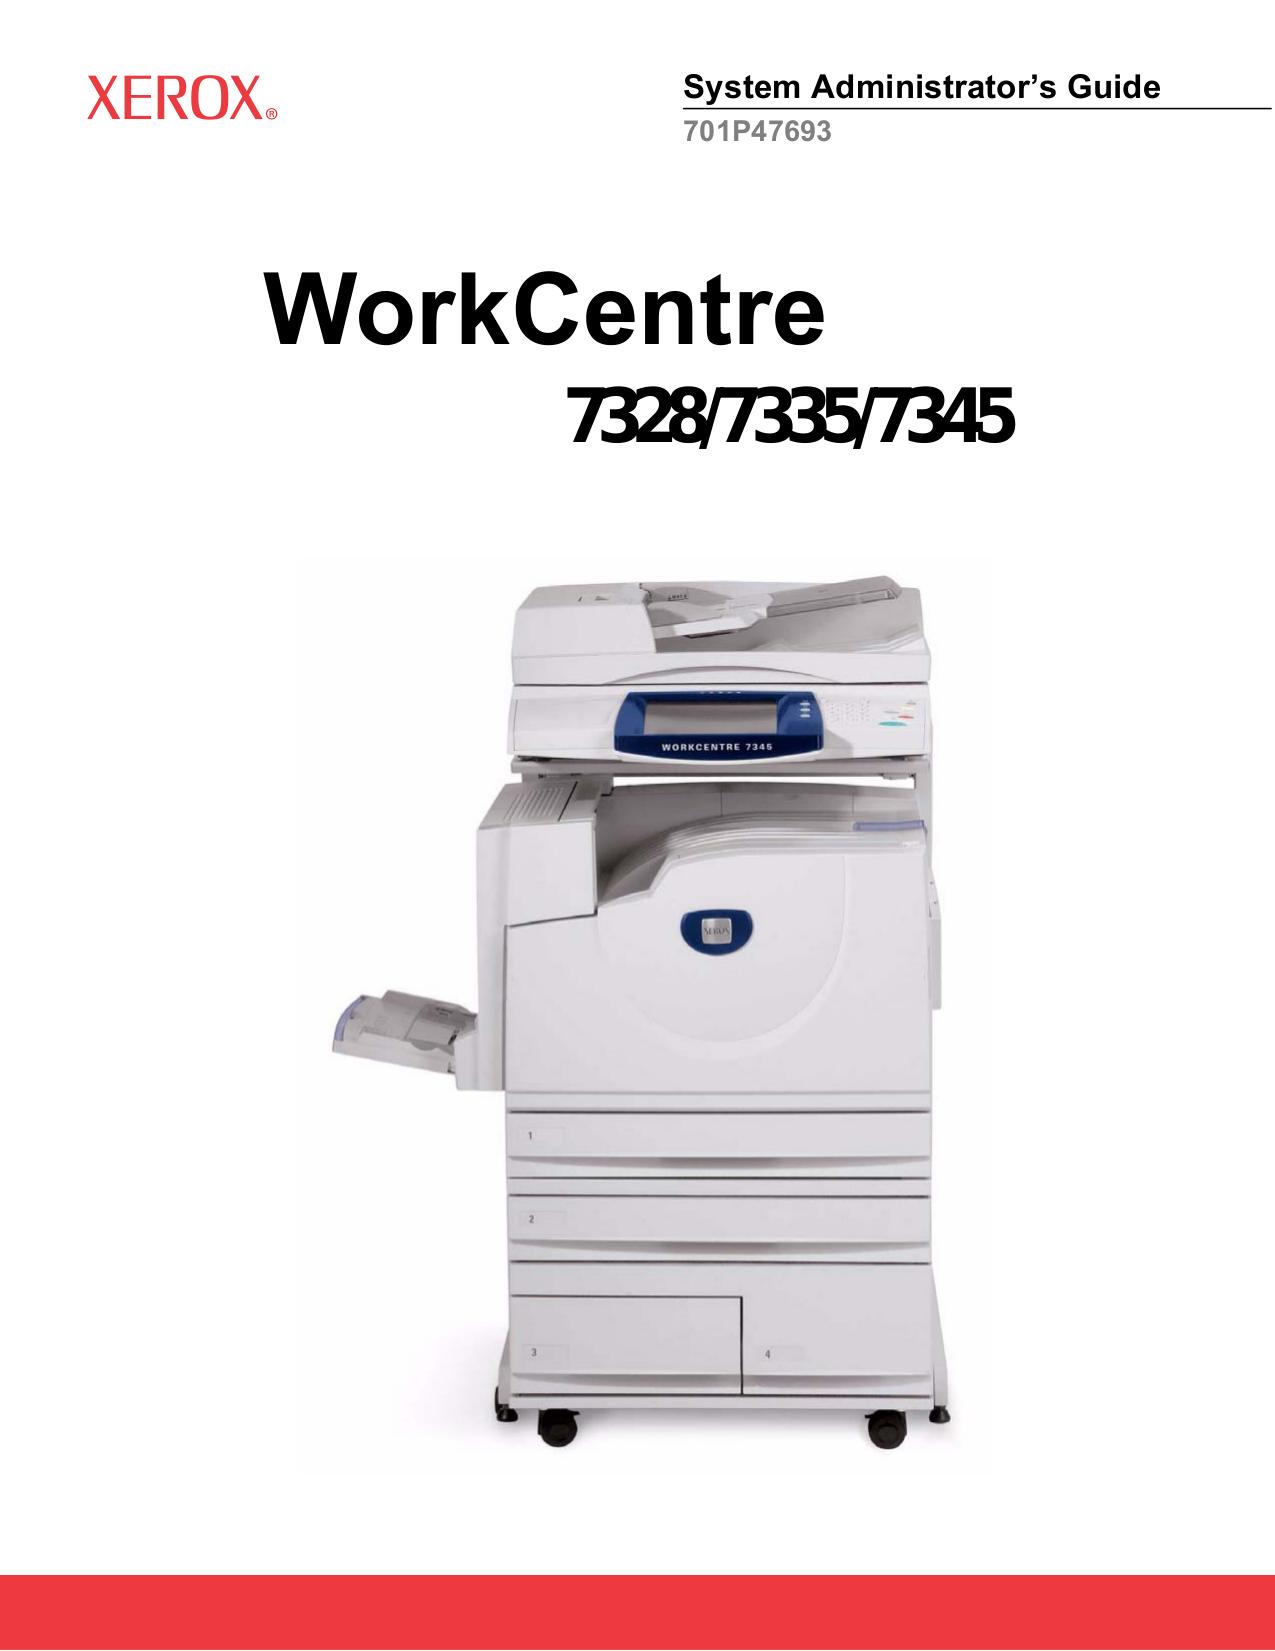 Download free pdf for Xerox WorkCentre 275 Printer manual